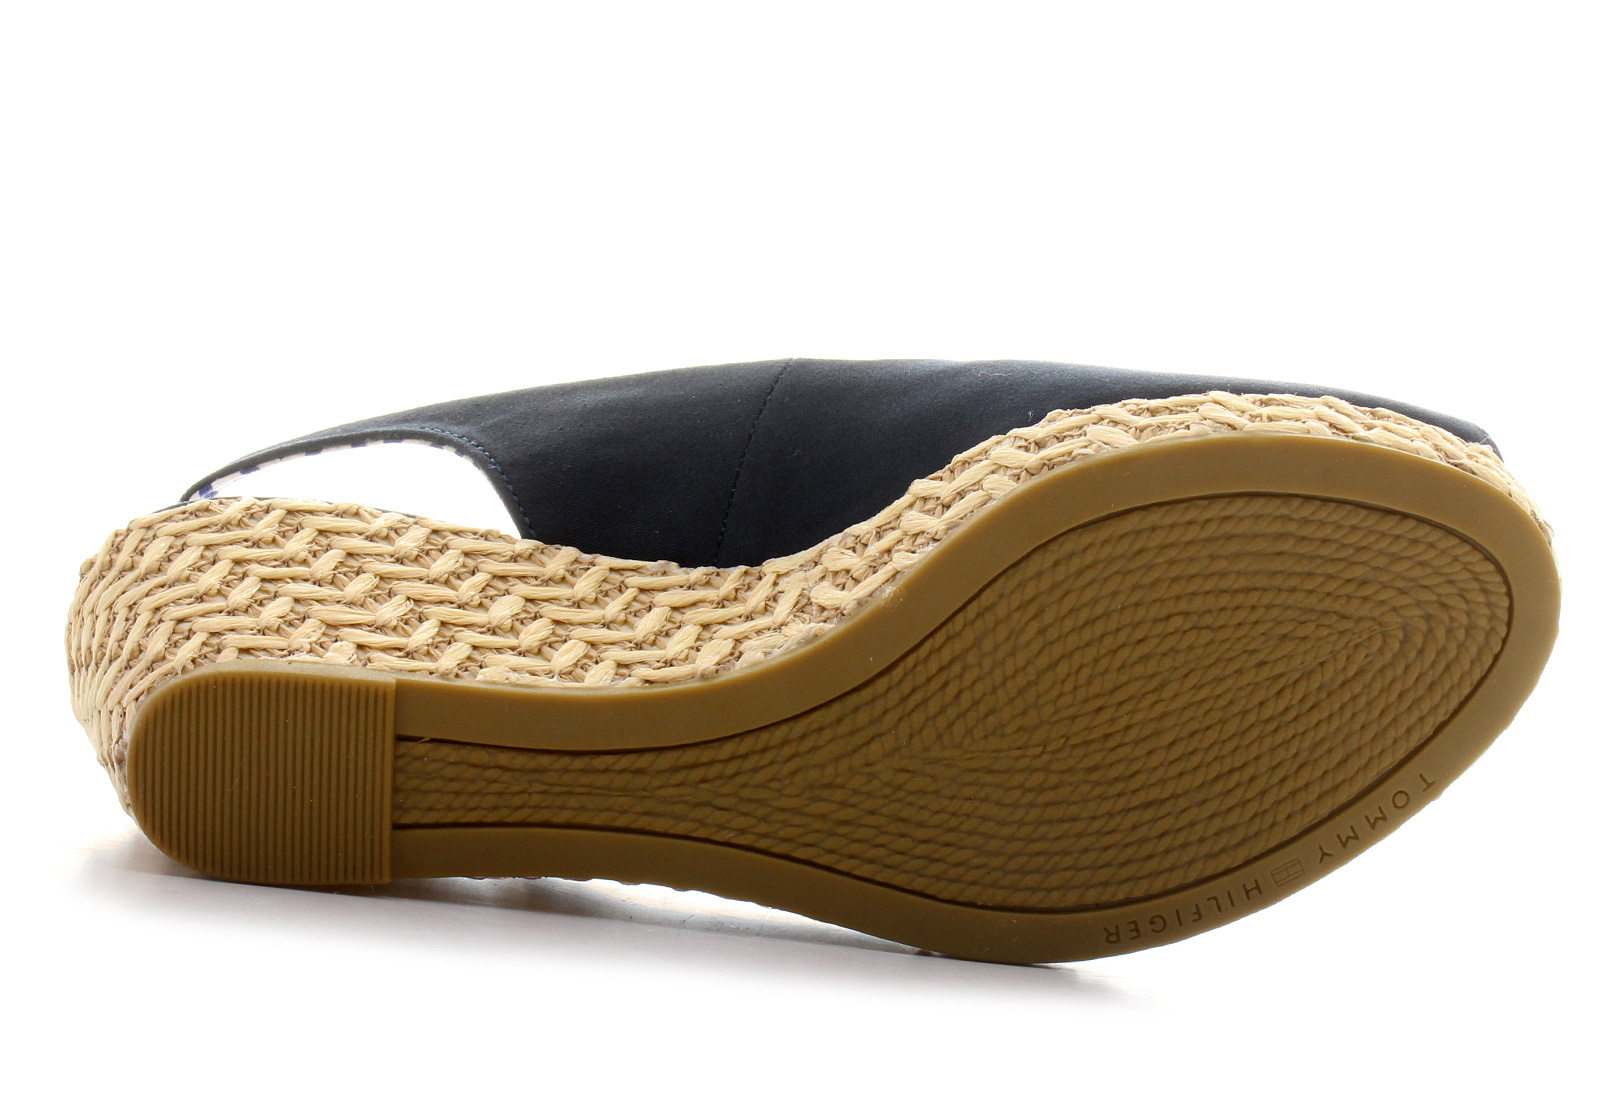 7fa03cdd5138 Tommy Hilfiger Platforma Plave Sandale - Elba 17d - Office Shoes ...